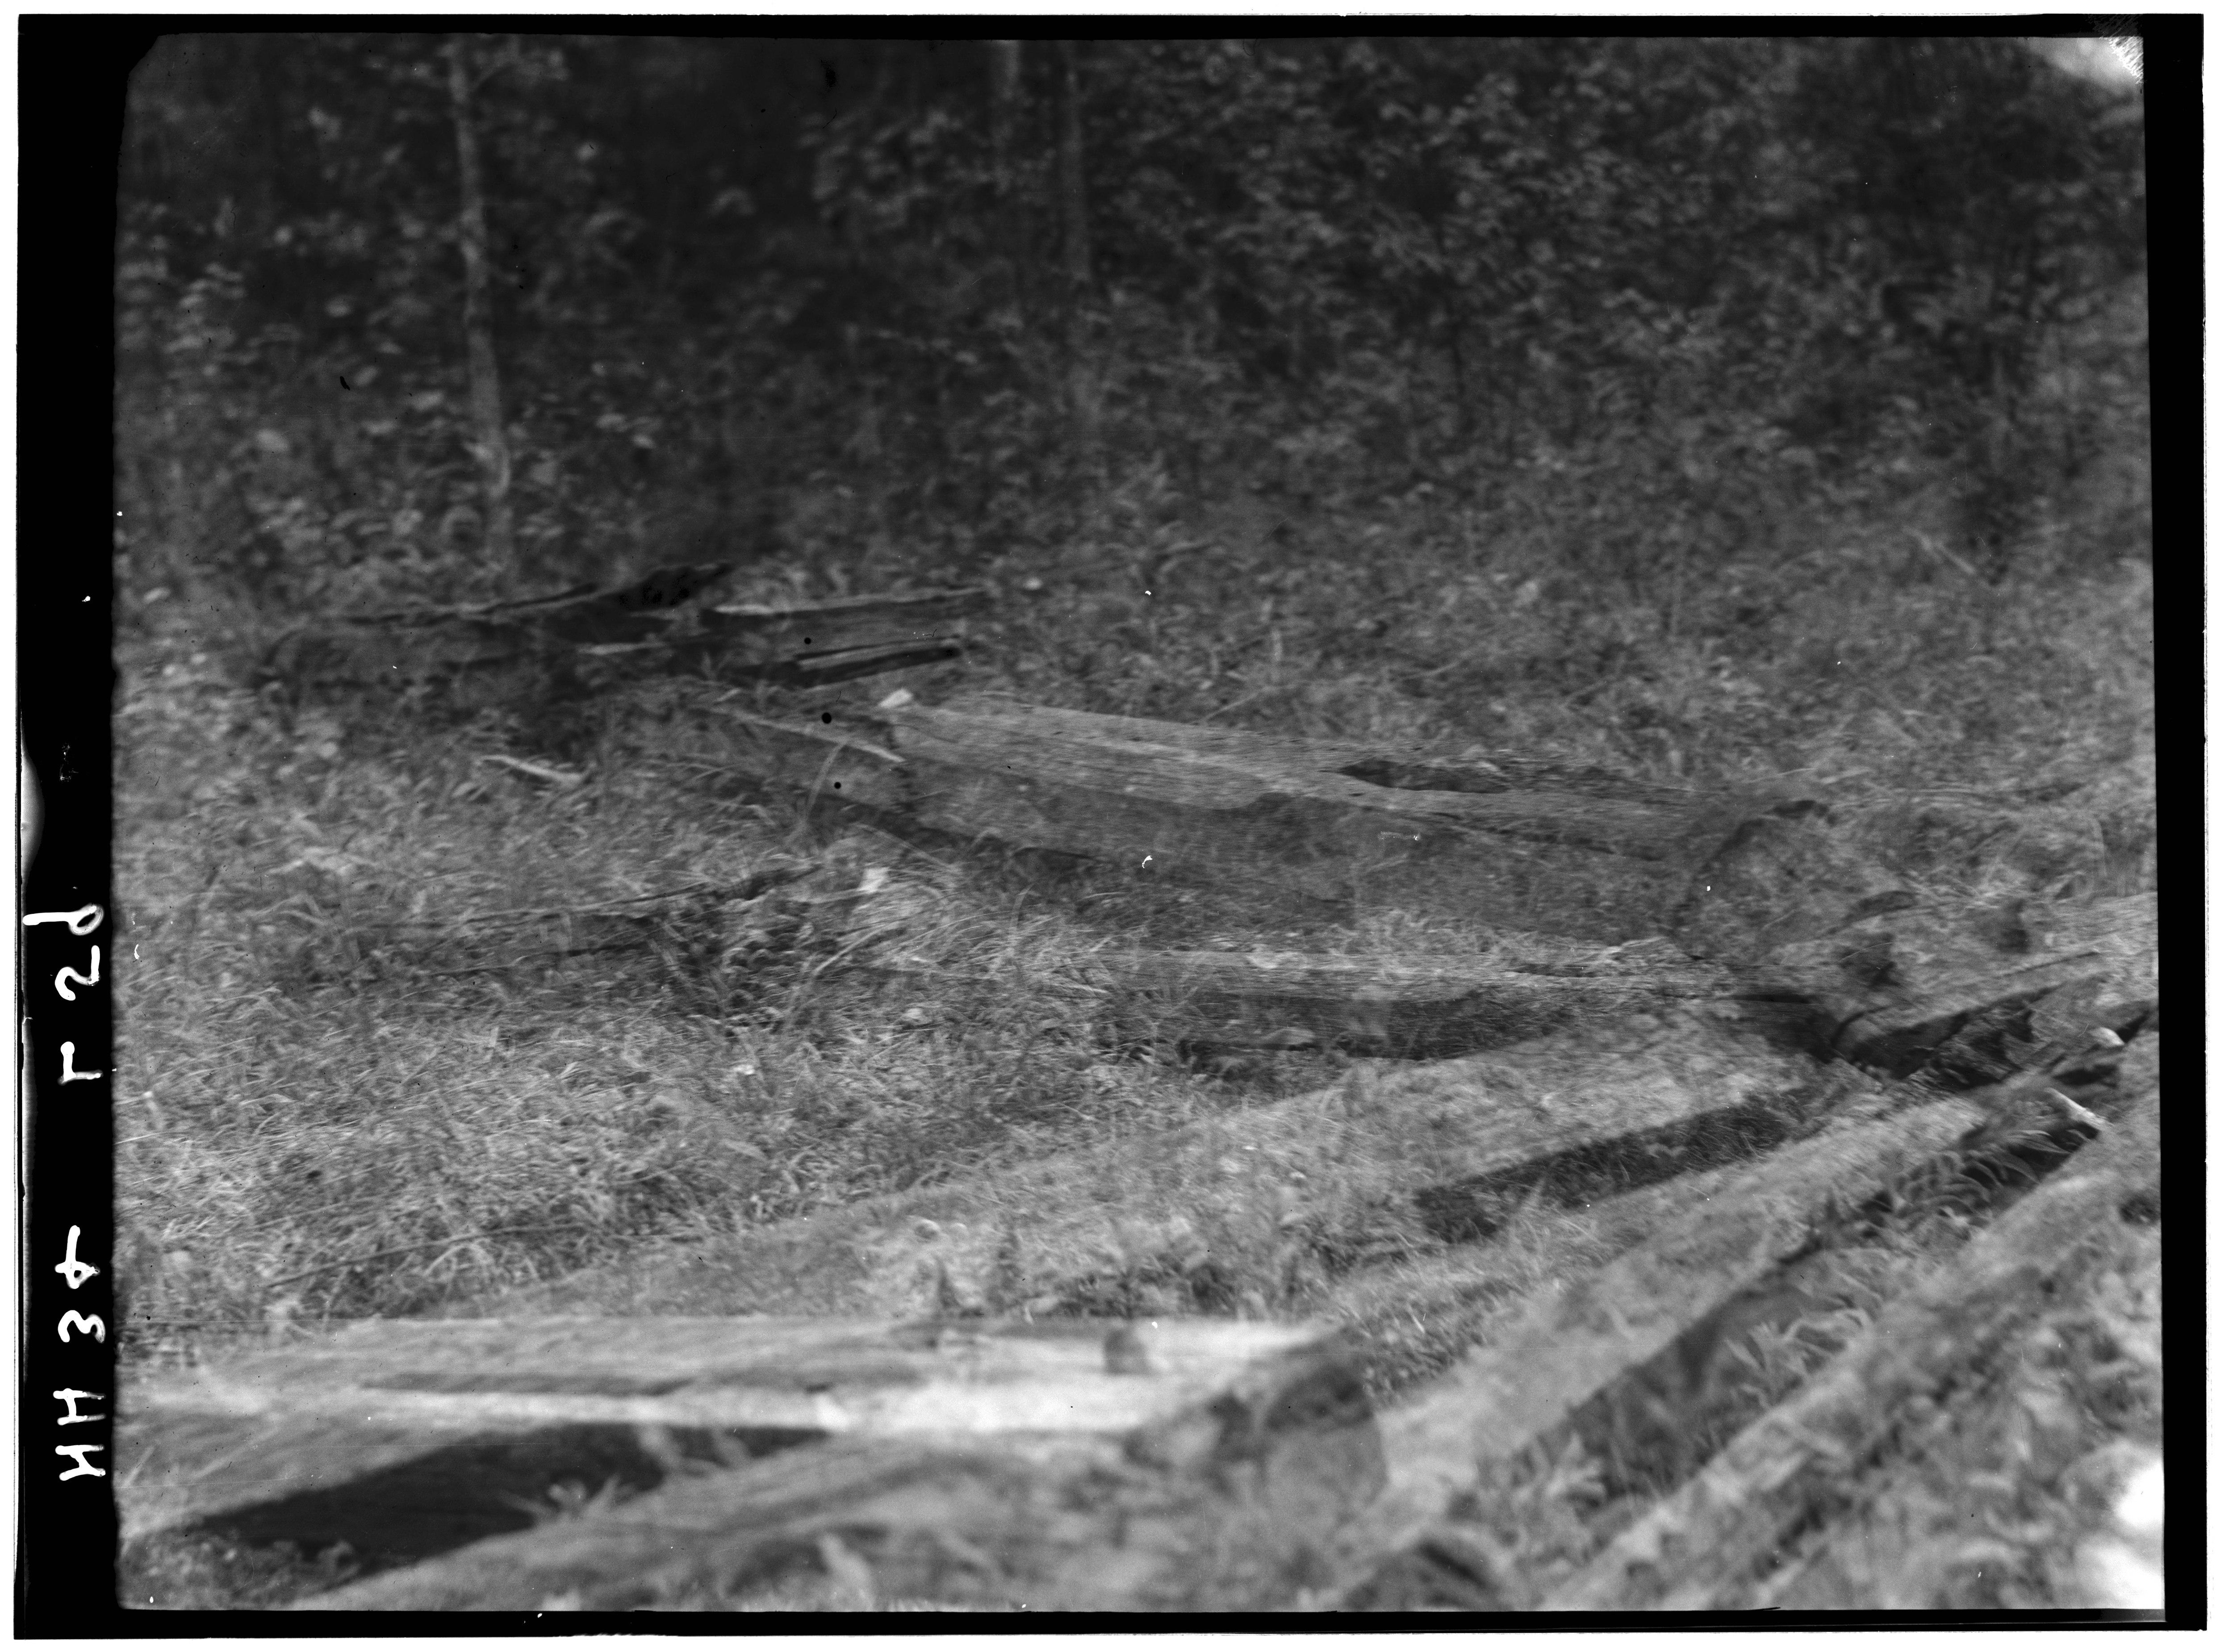 Lever Arm Of Saw : File historic american buildings survey j c fletcher